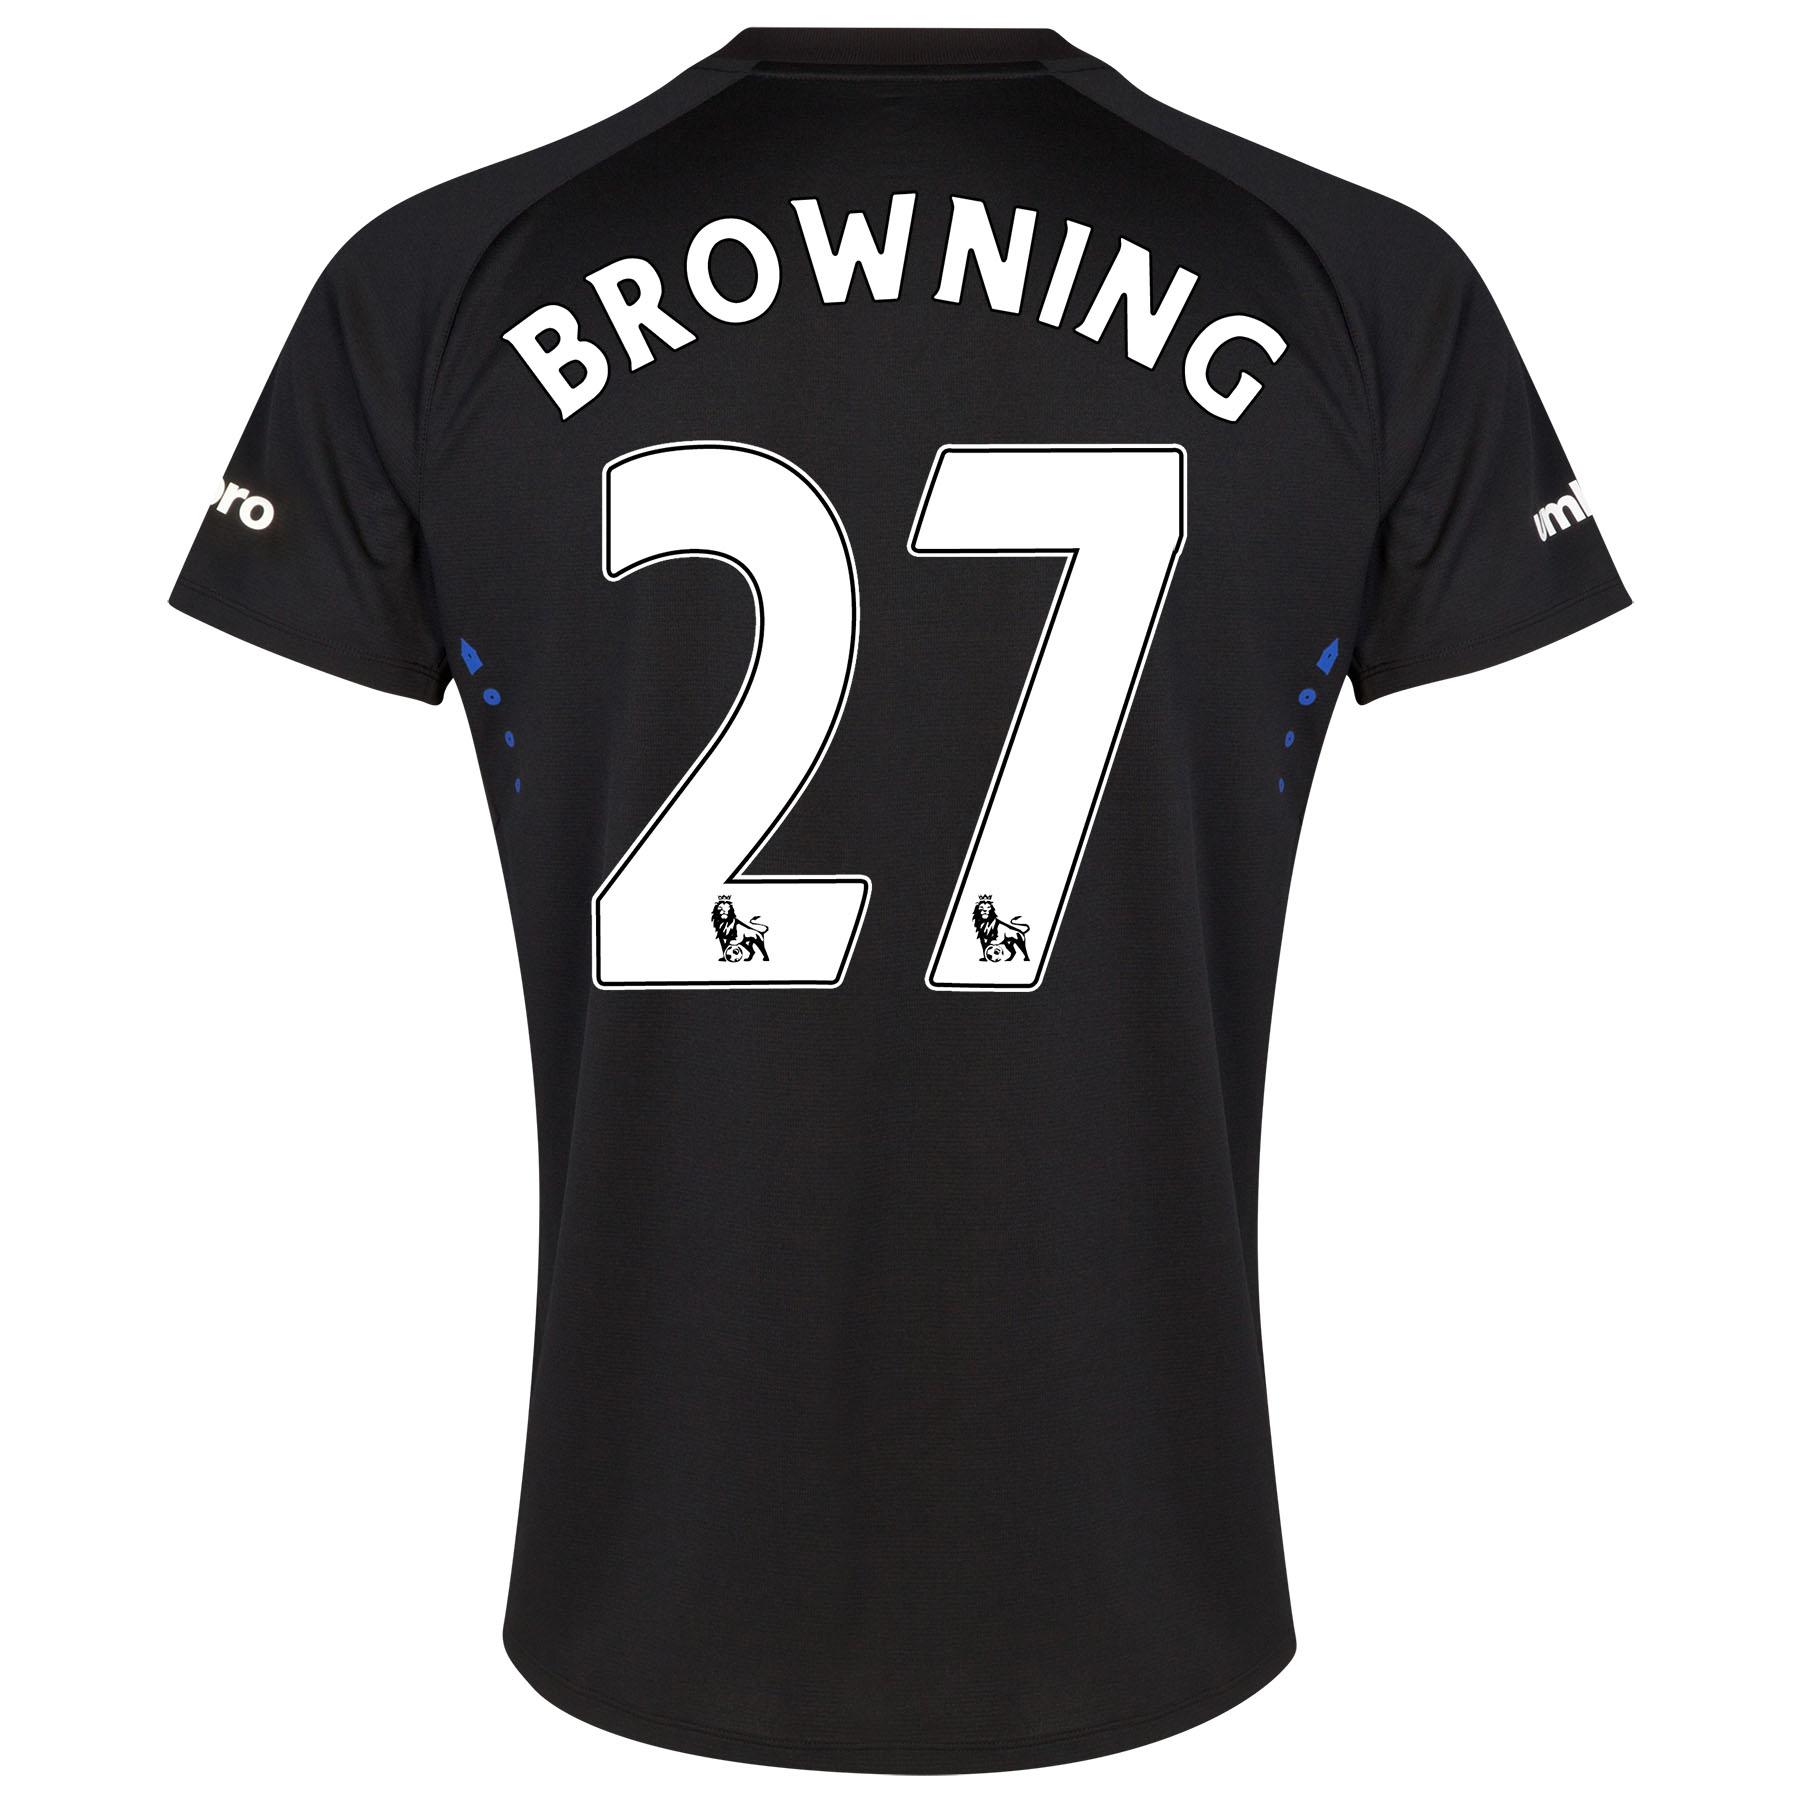 Everton SS Away Shirt 2014/15 with Browning 36 printing